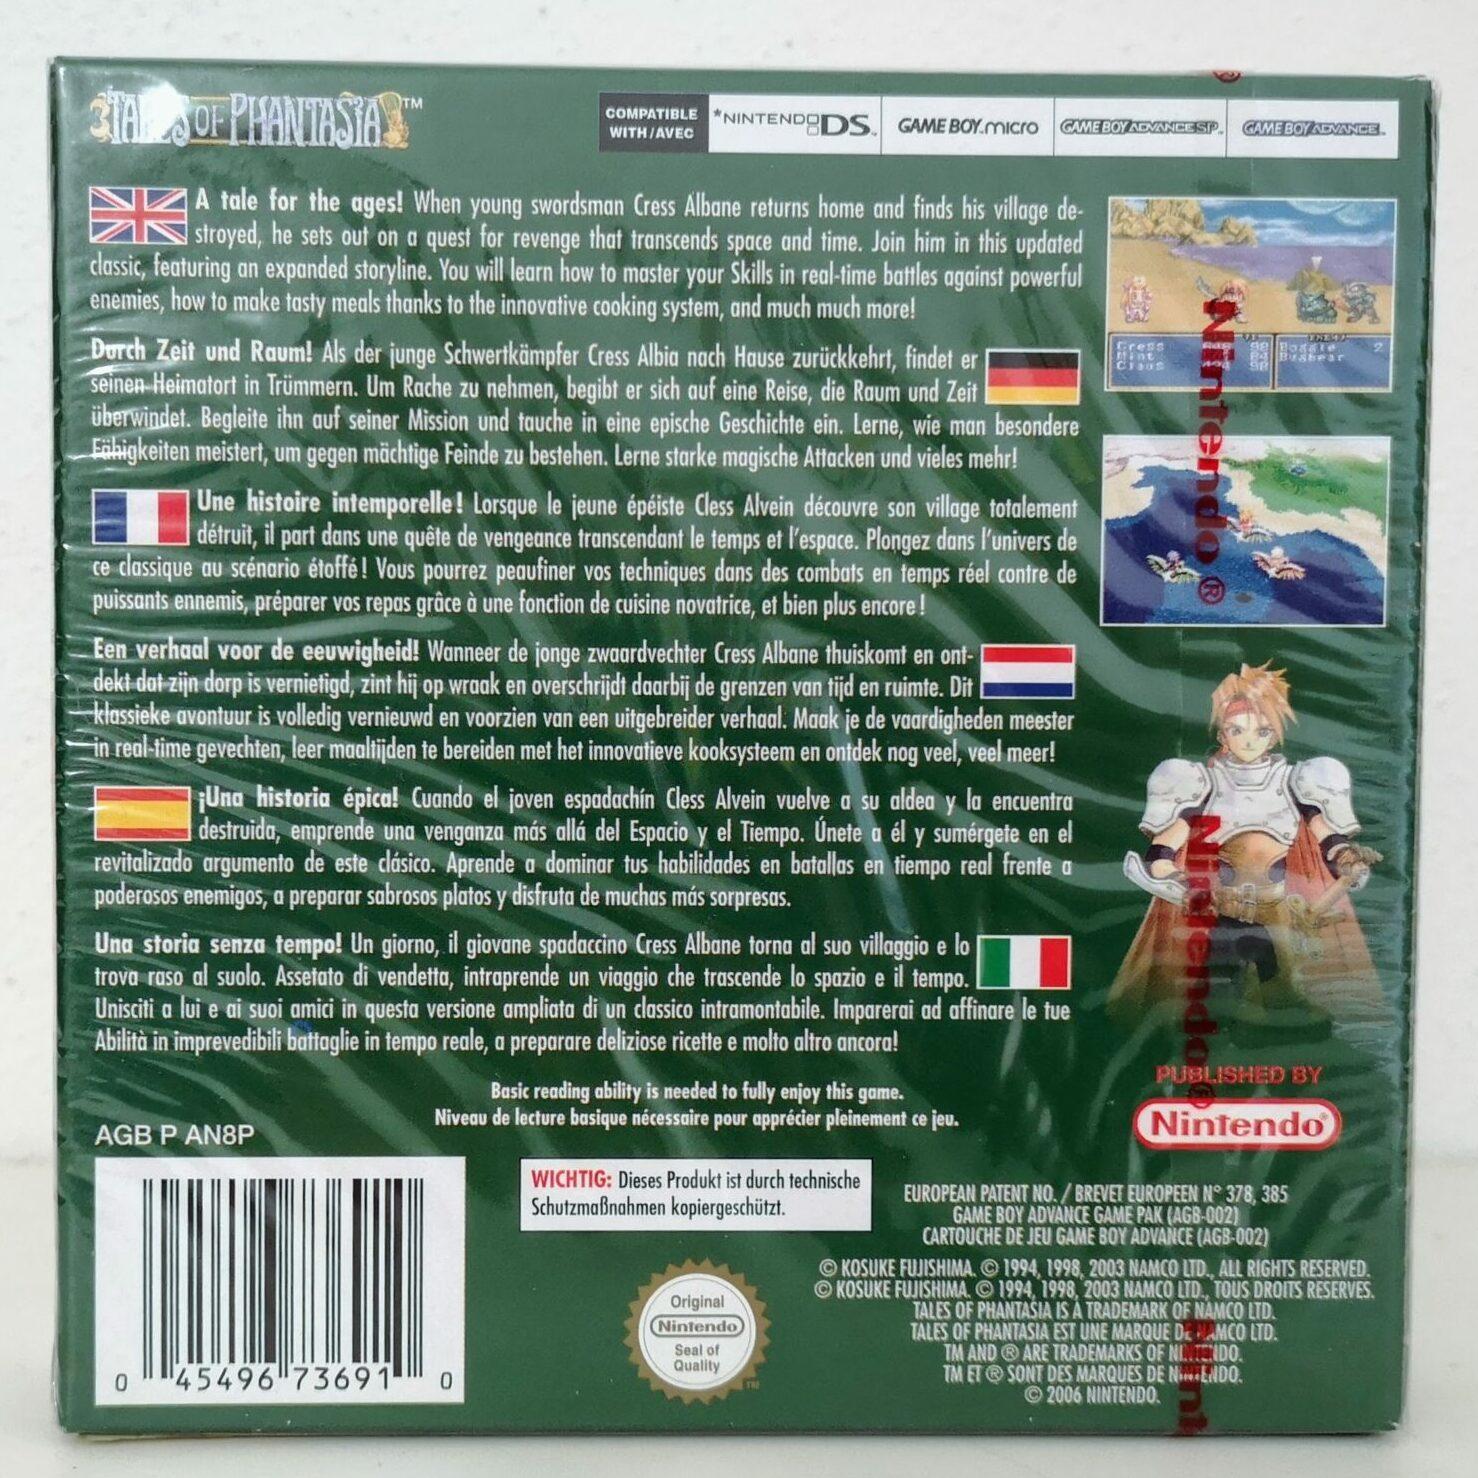 Tales of Phantasia (2006 Nintendo Game Boy Advance), copertina retro